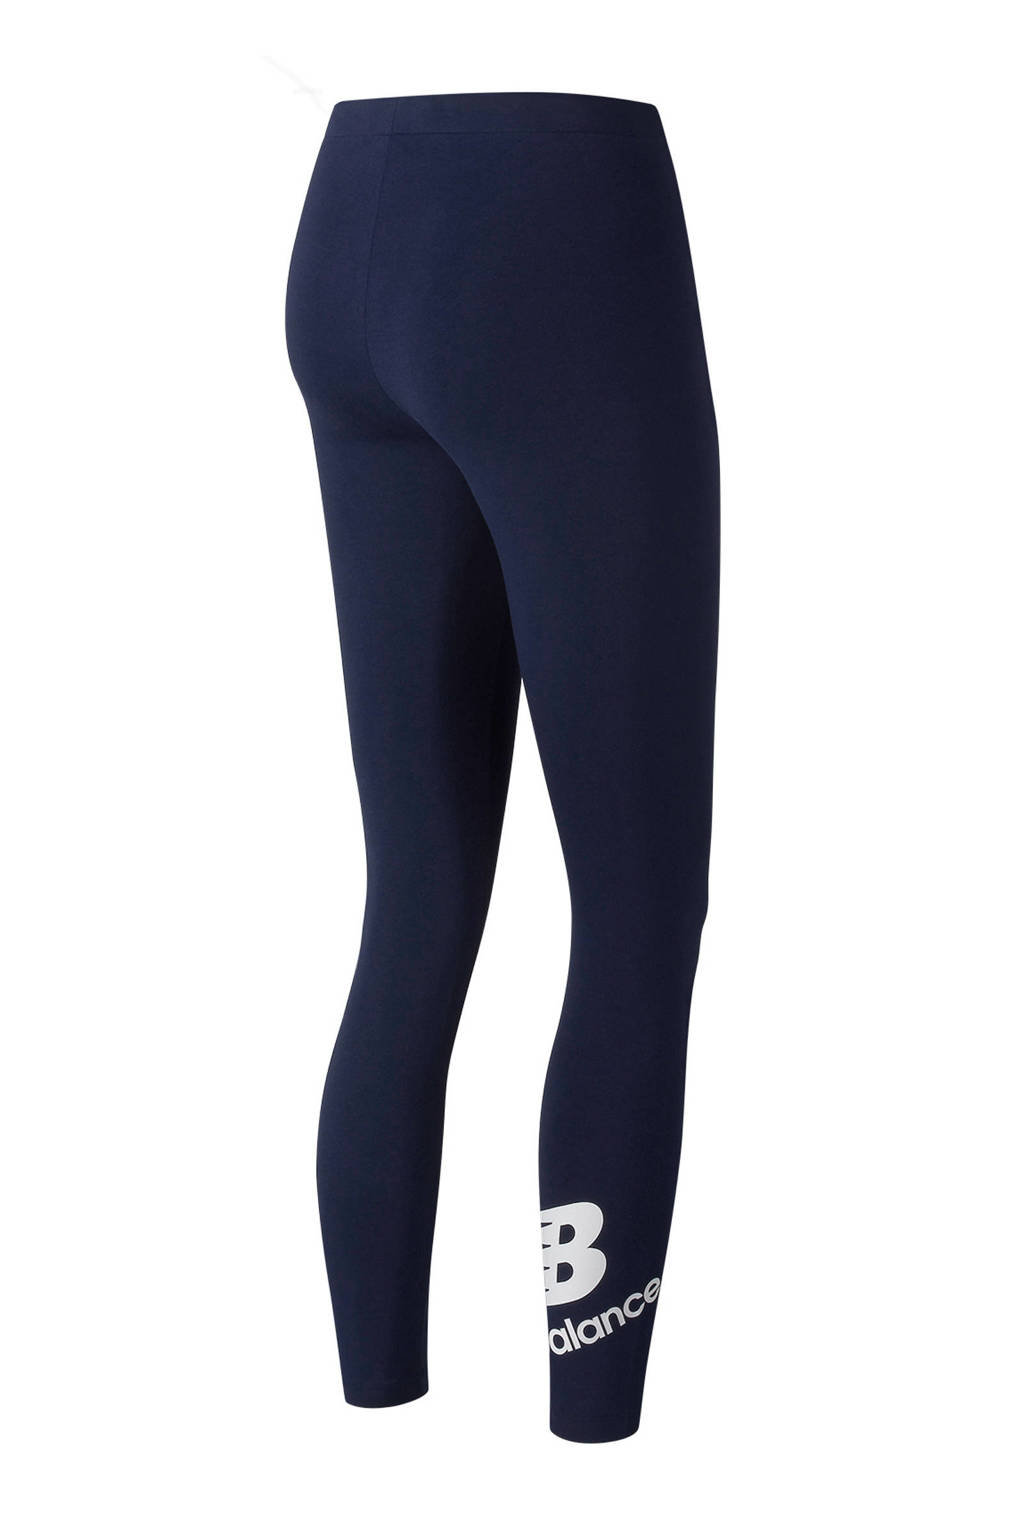 New Balance legging donkerblauw, Donkerblauw/wit